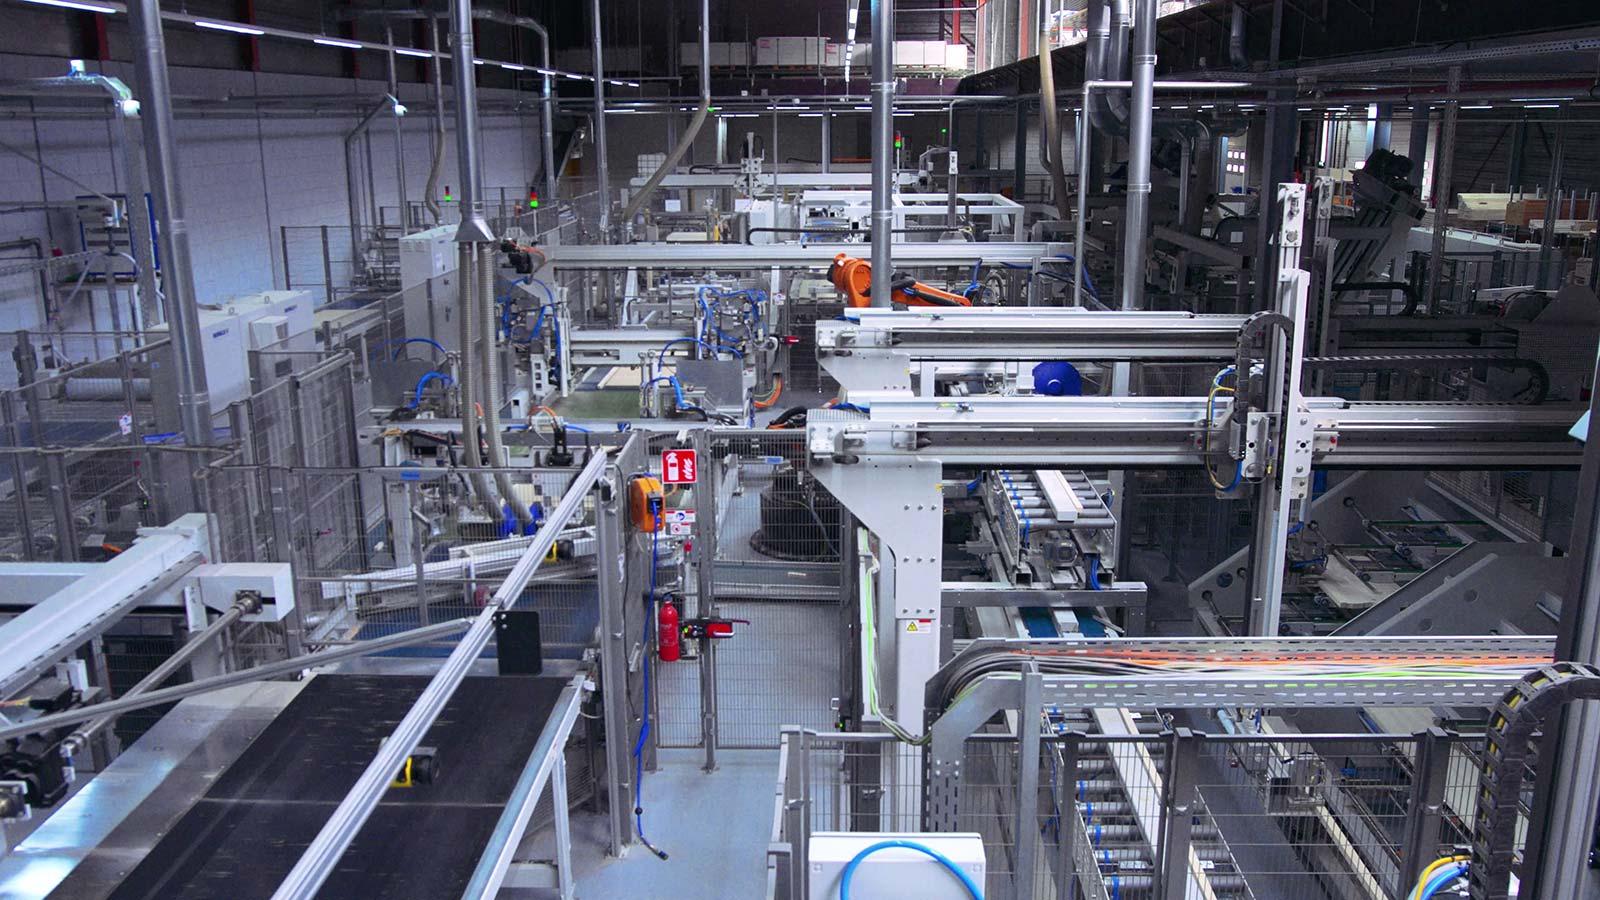 techniek-procesindustrie-fabriek-machinepark-video-filmproductie